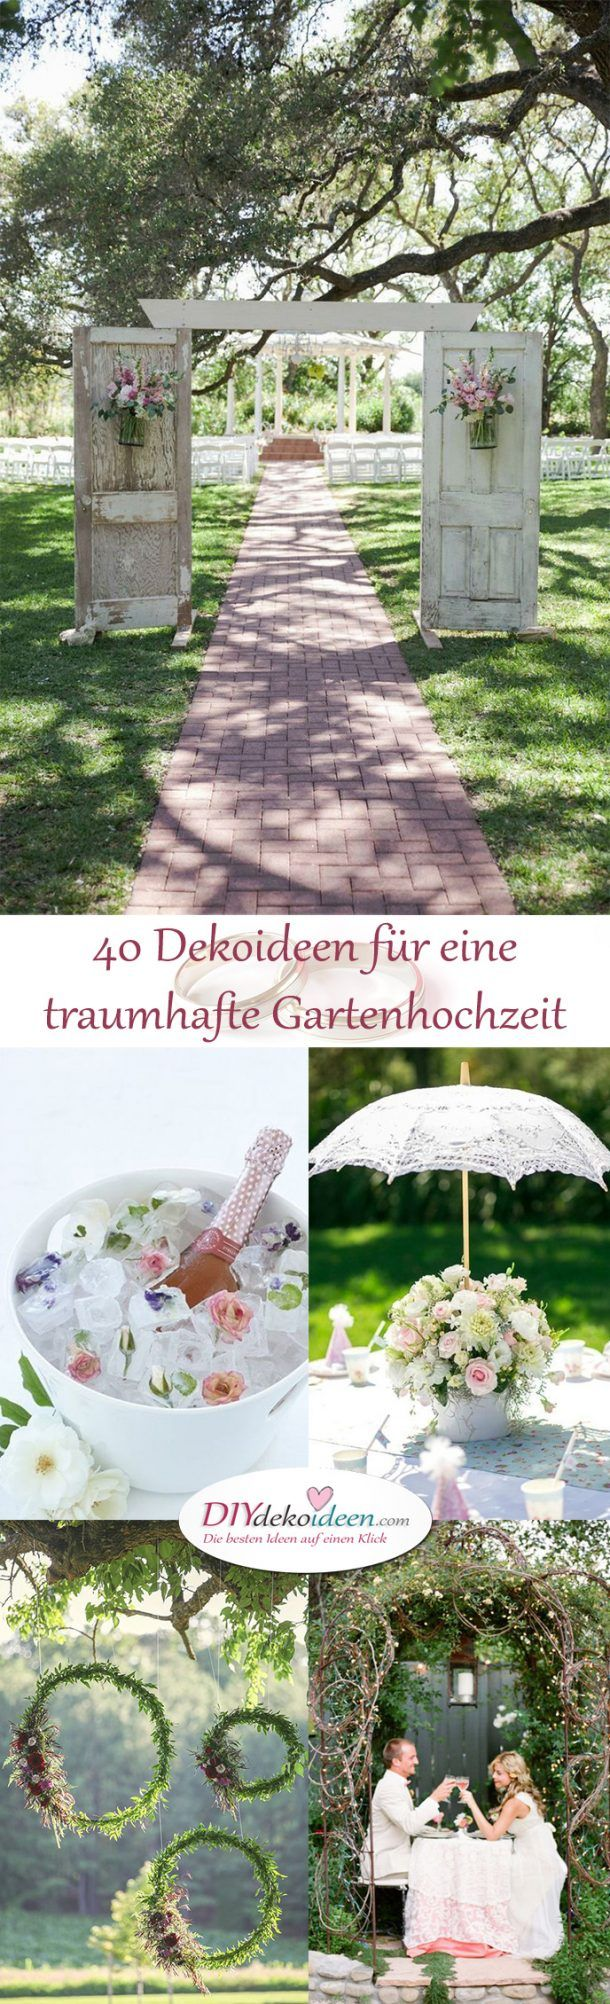 Garten Hochzeit - DIY Dekoideen